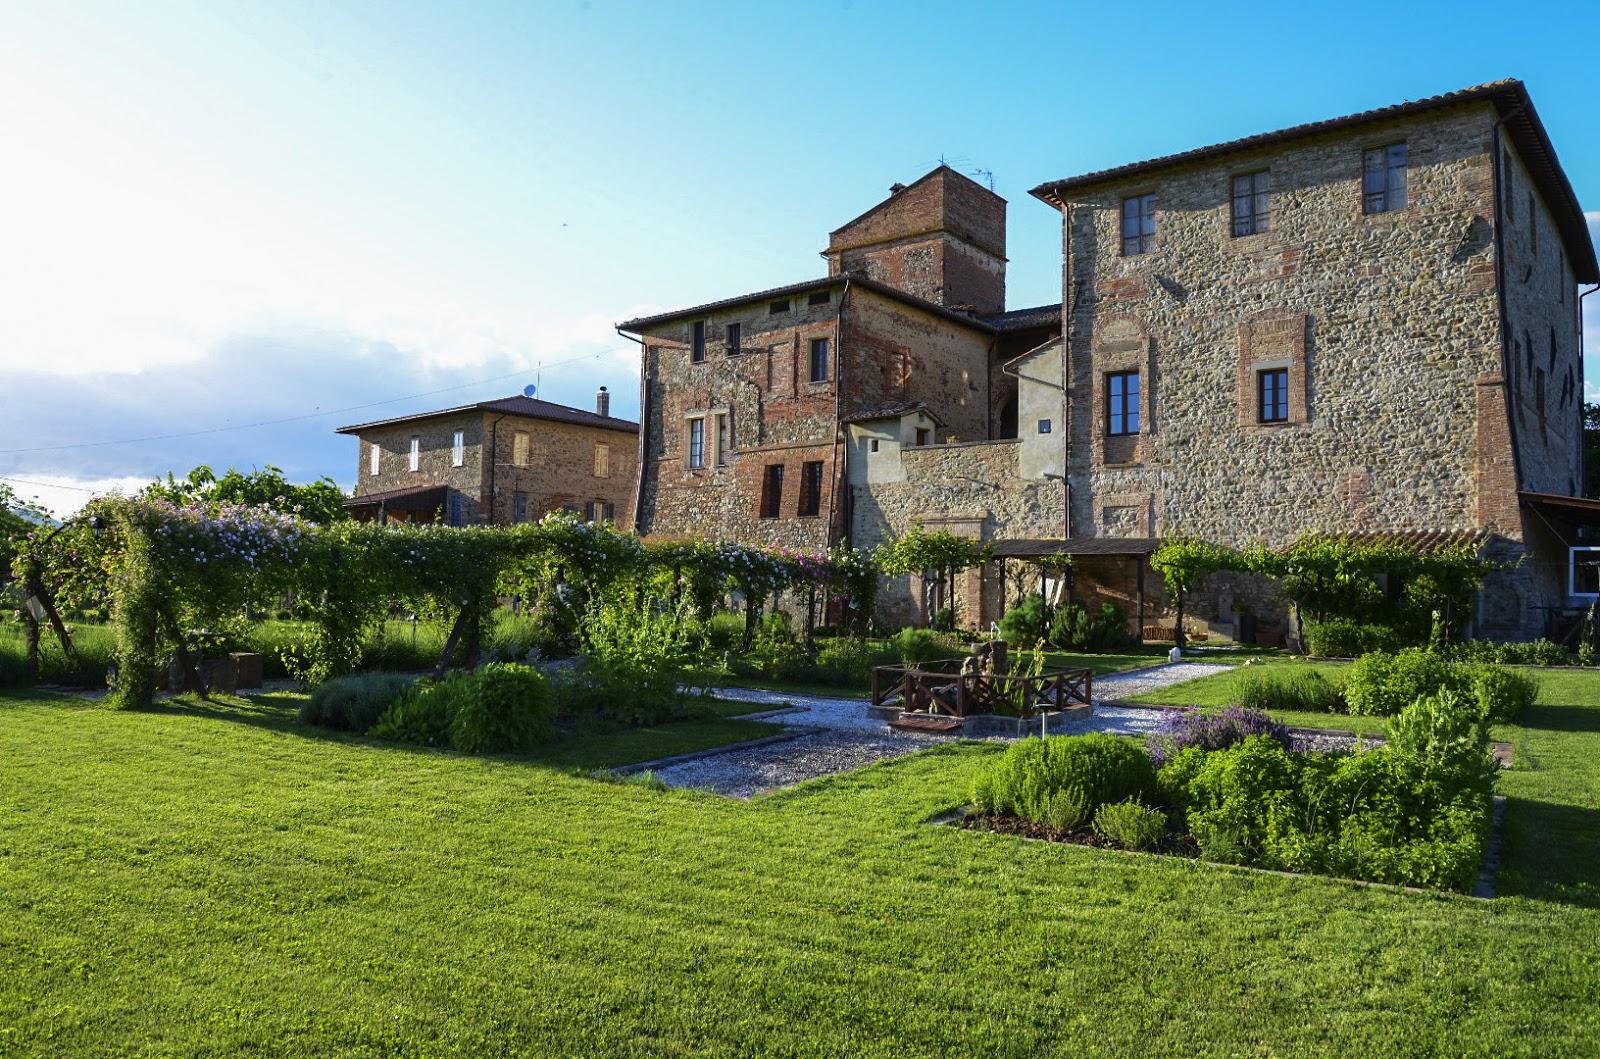 Matrimonio Campagna Toscana : Matrimonio ecologico a km in agriturismo